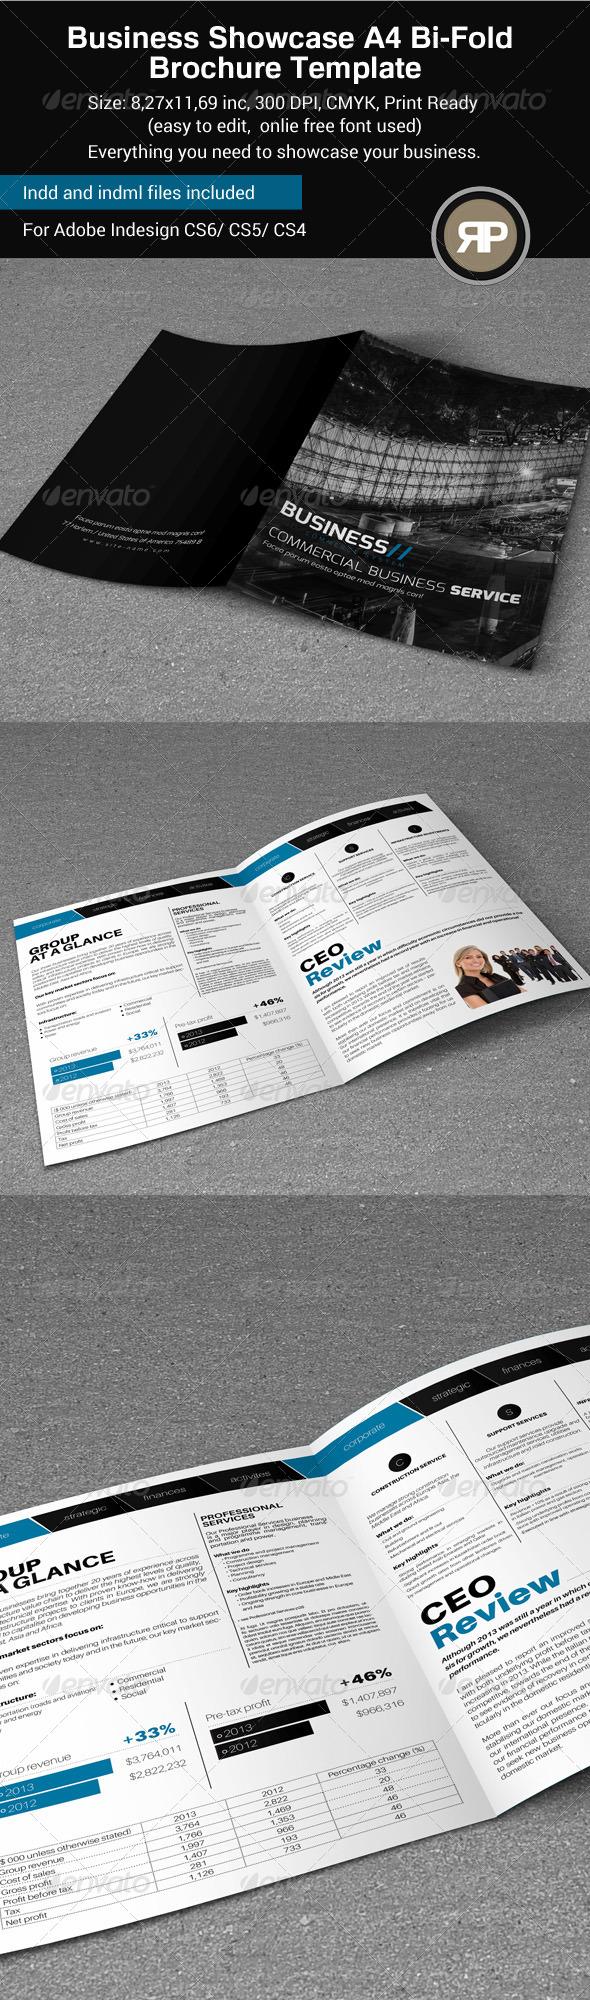 GraphicRiver Business Showcase A4 Bi-Fold Brochure 8190185